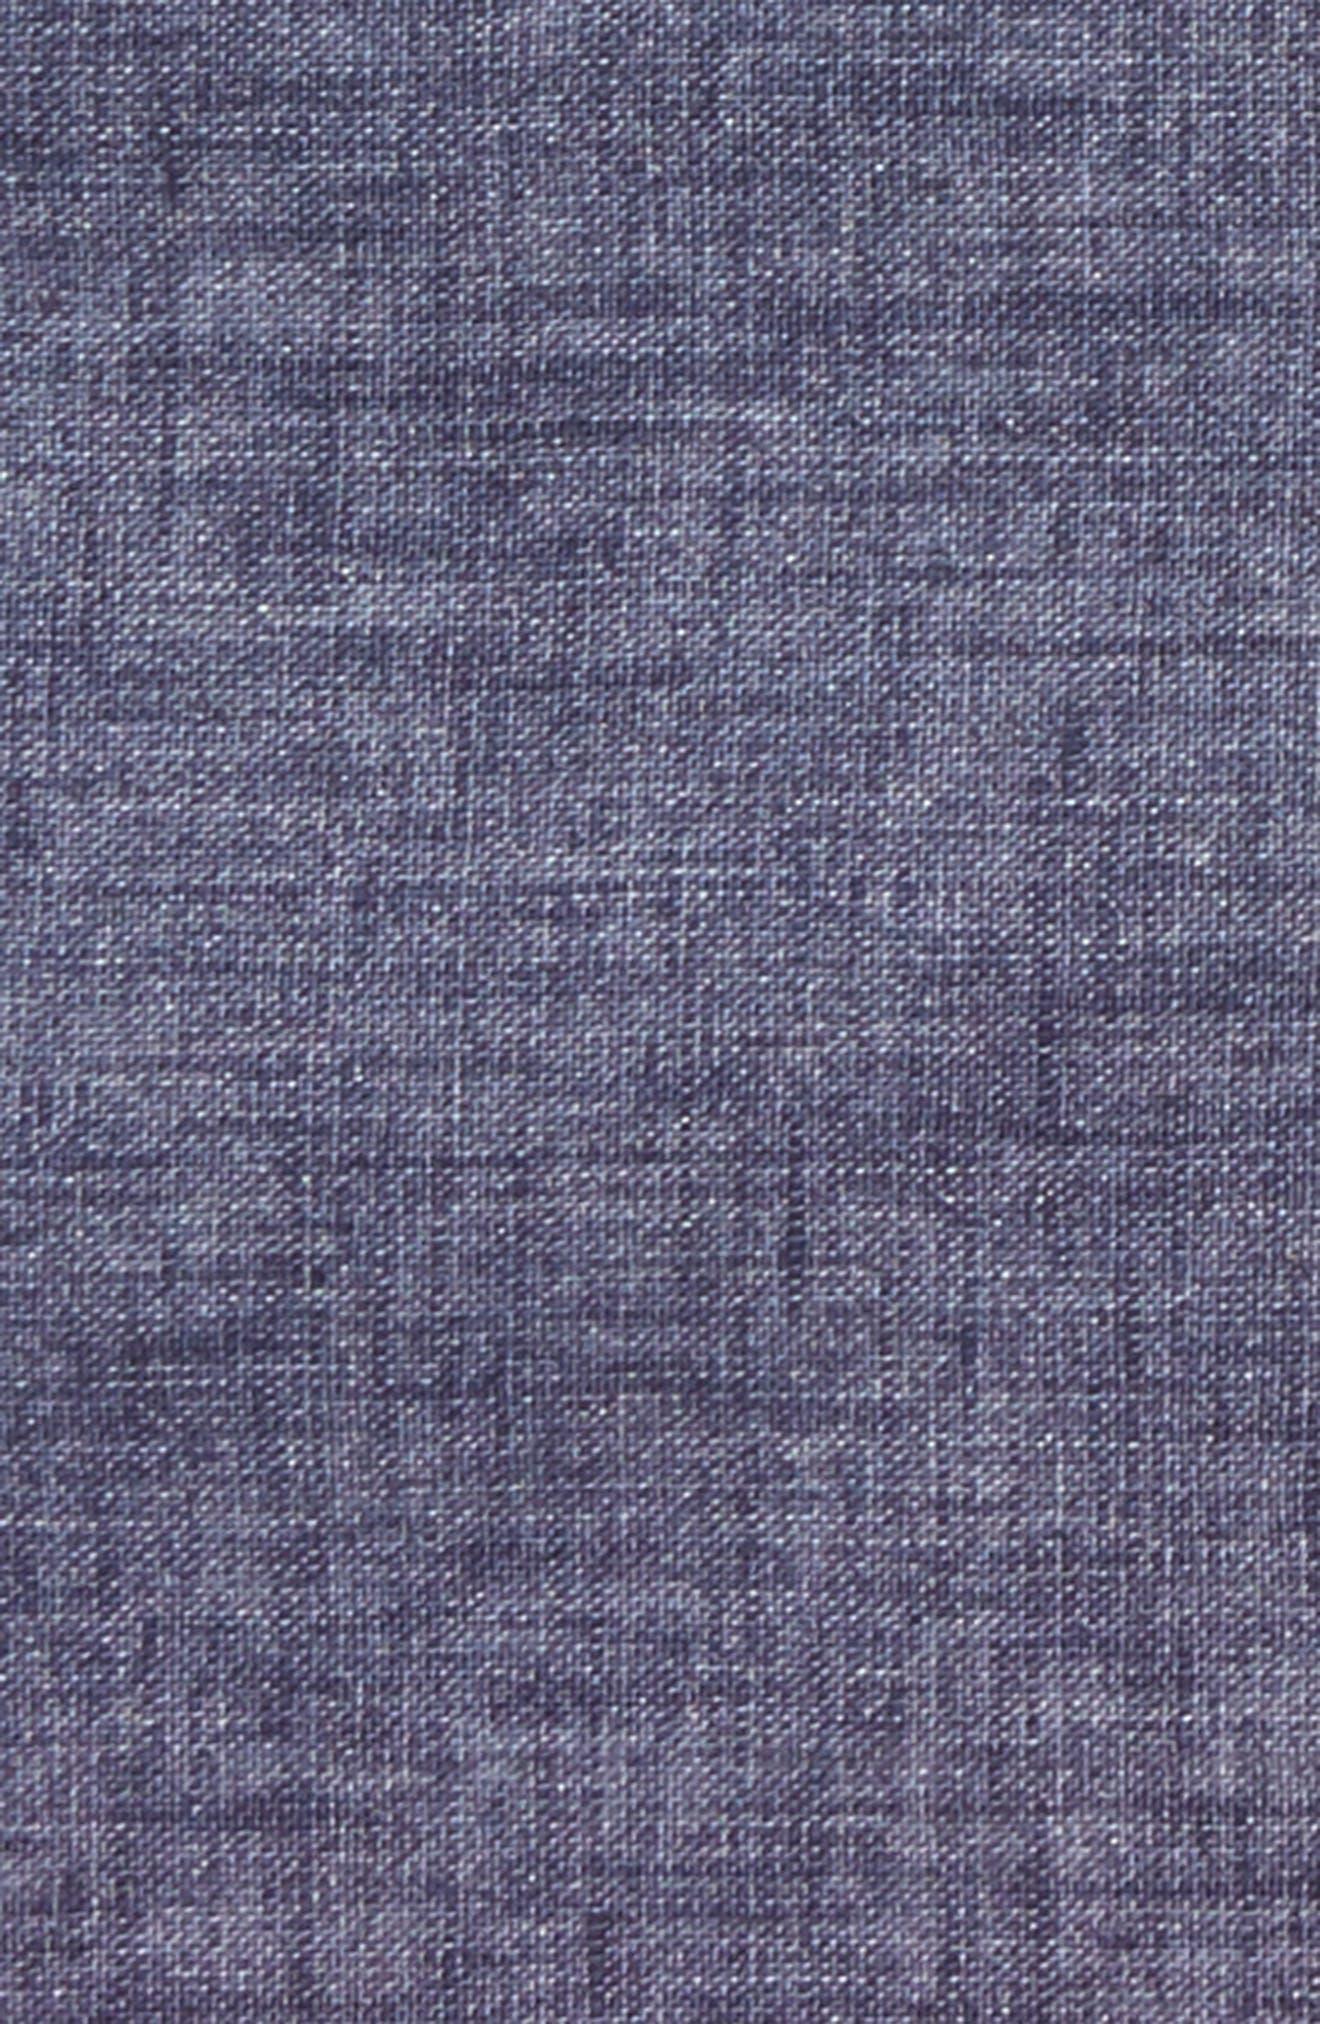 Solid Linen Pocket Square,                             Alternate thumbnail 3, color,                             020